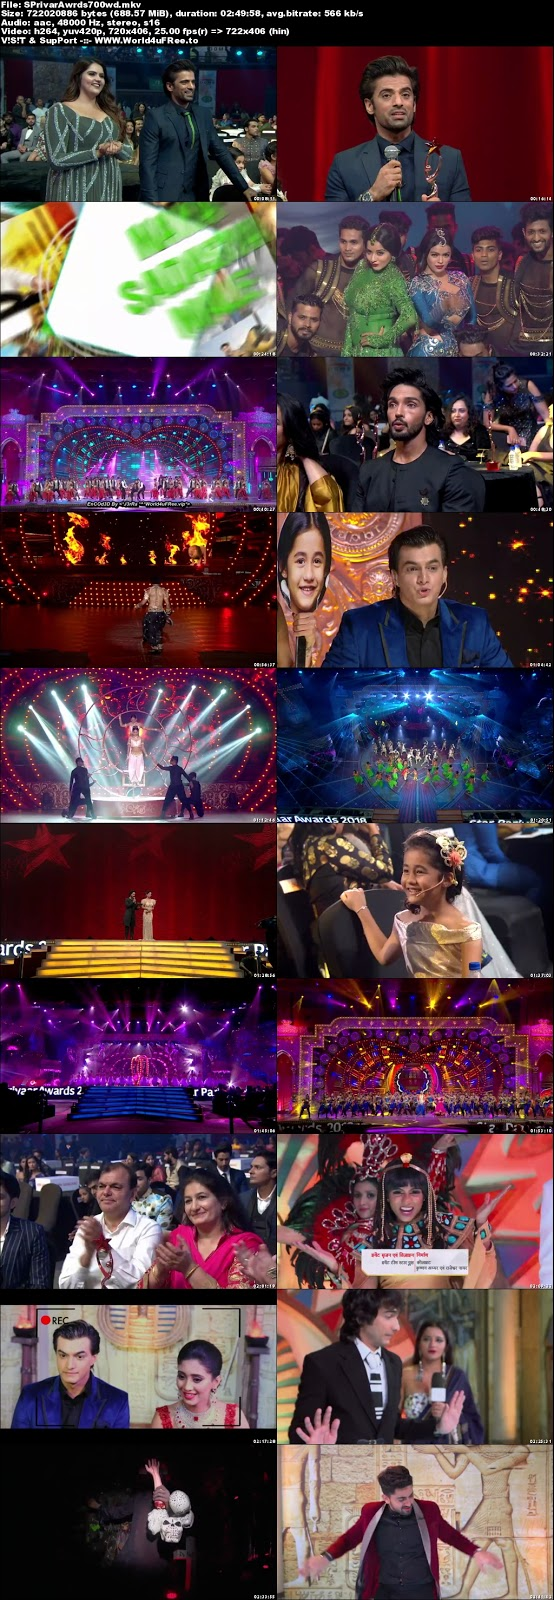 Star Parivaar Awards 2018 Hindi WEBHD 480p 700Mb x264 world4ufree.vip tv show Star Parivaar Awards 2018 Main Event hindi tv show tv show compressed small size free download or watch online at world4ufree.vip